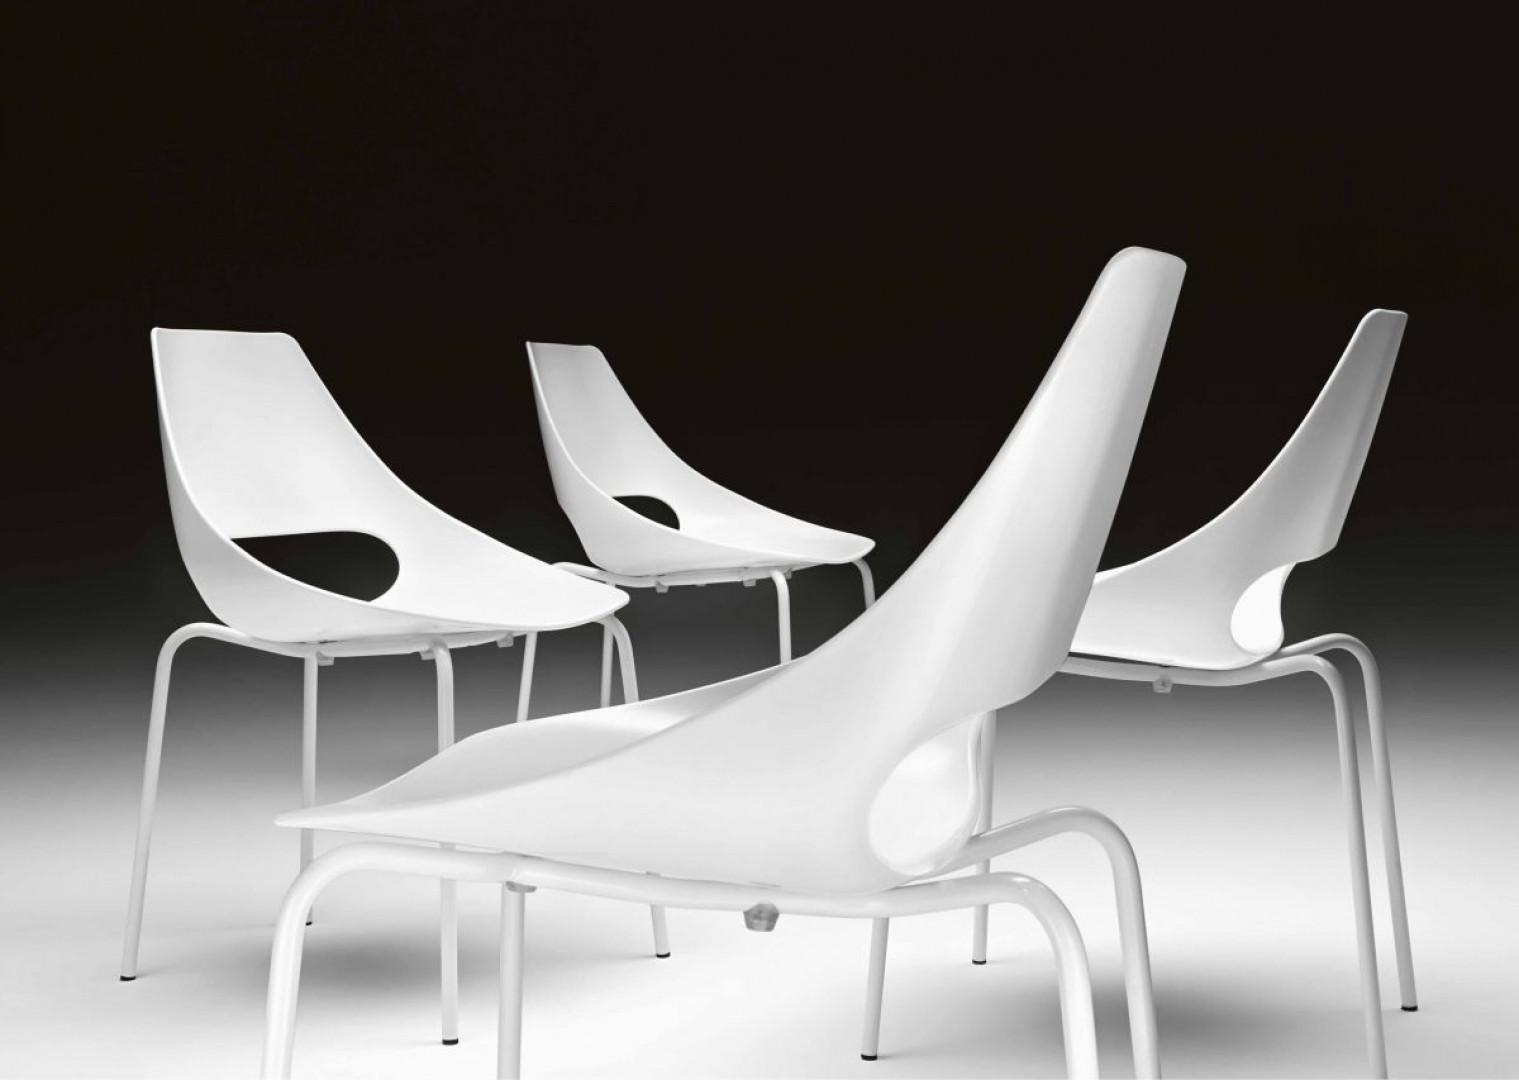 Krzesła z kolekcji Echo firmy Metalmobil. Projek: RDM. Fot. Metalmobil